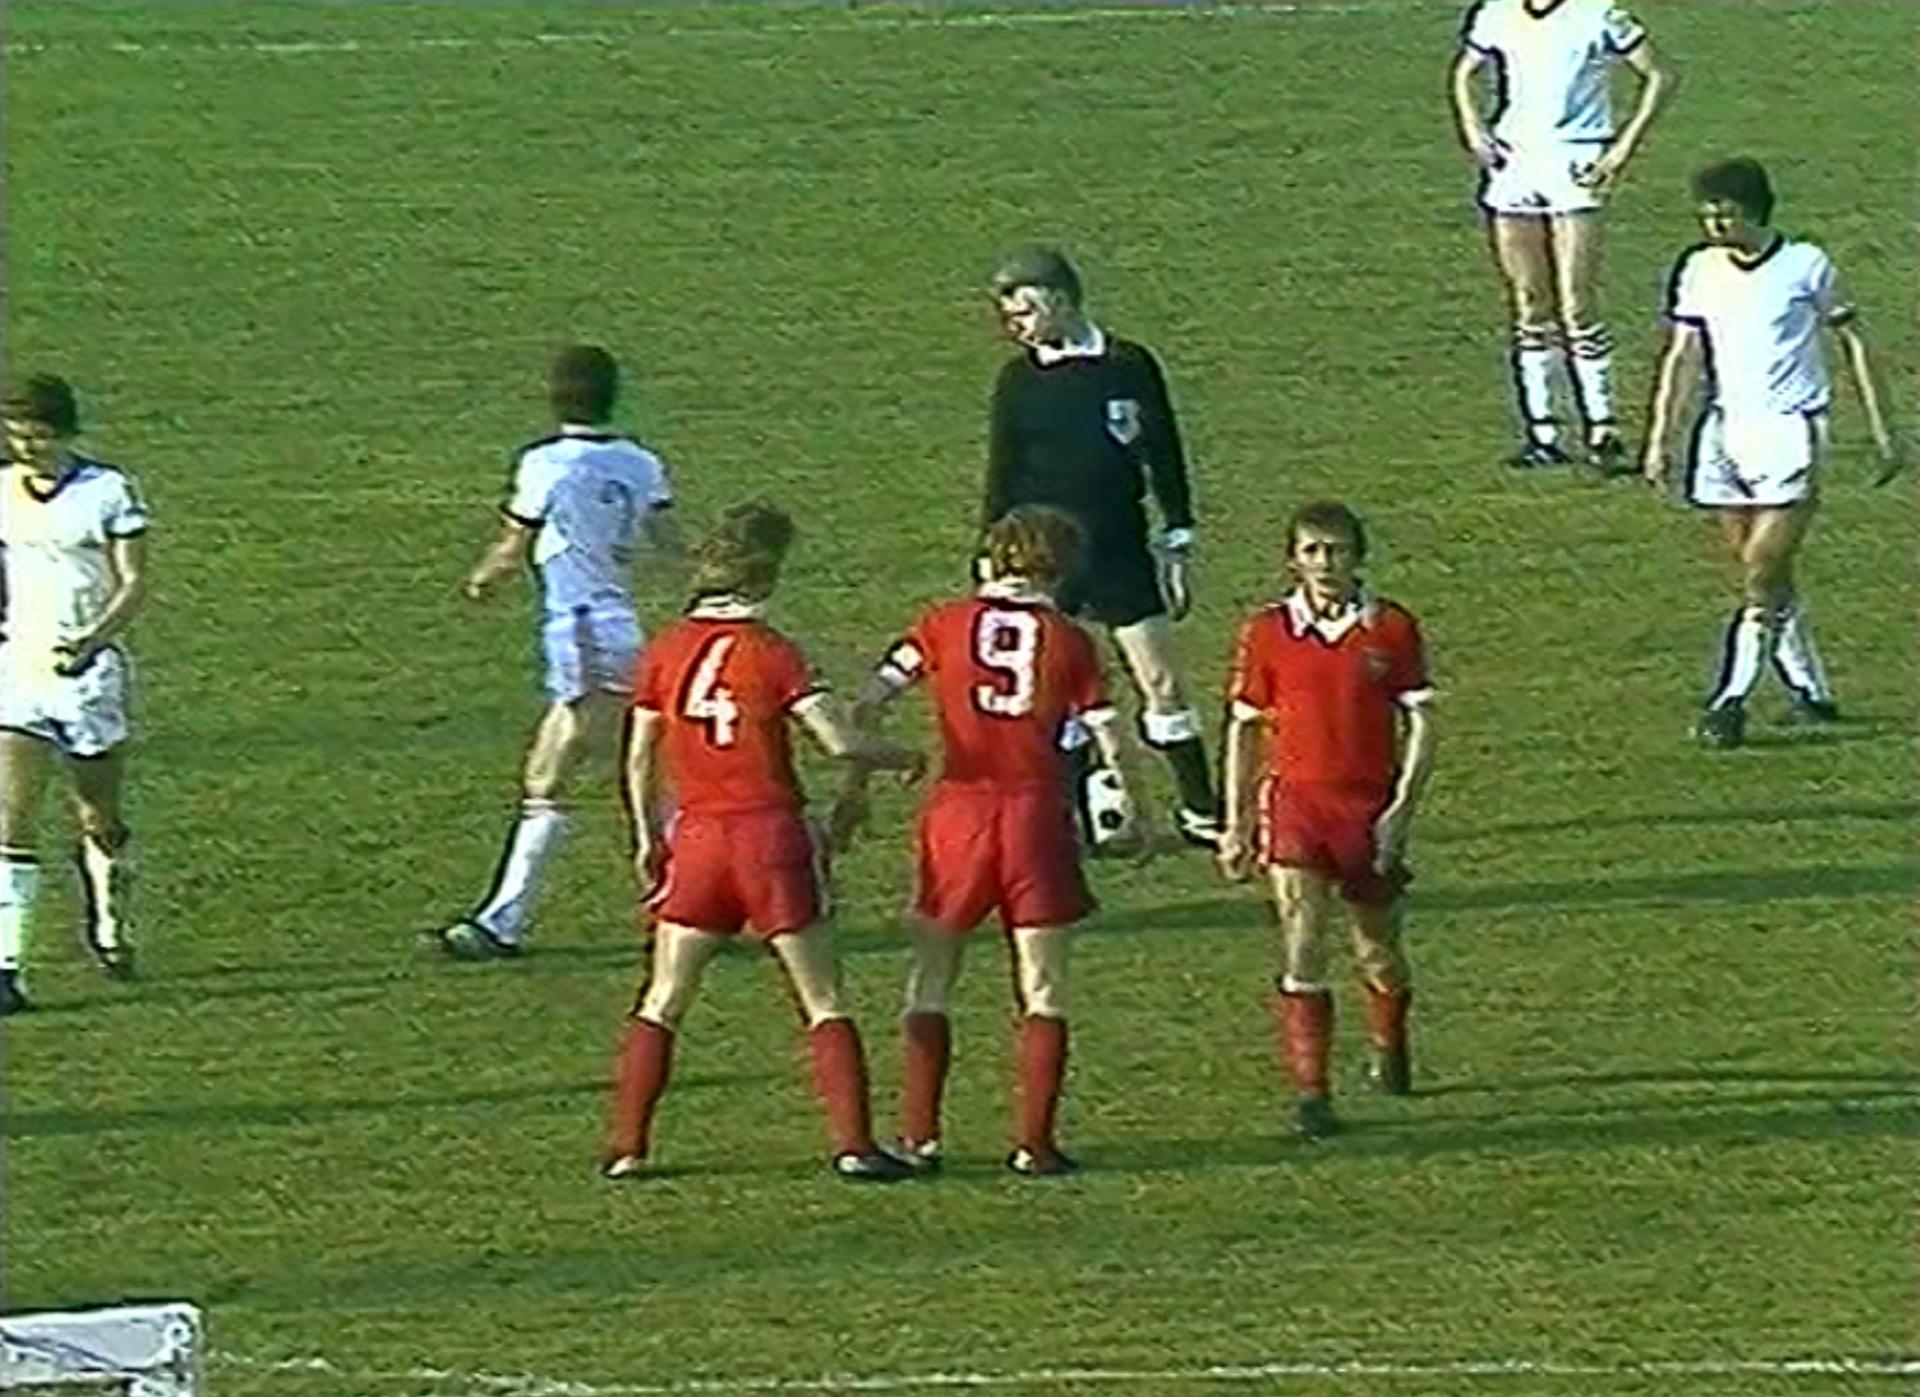 Widzew Łódź - PSV Eindhoven 3:5 (19.10.1977)